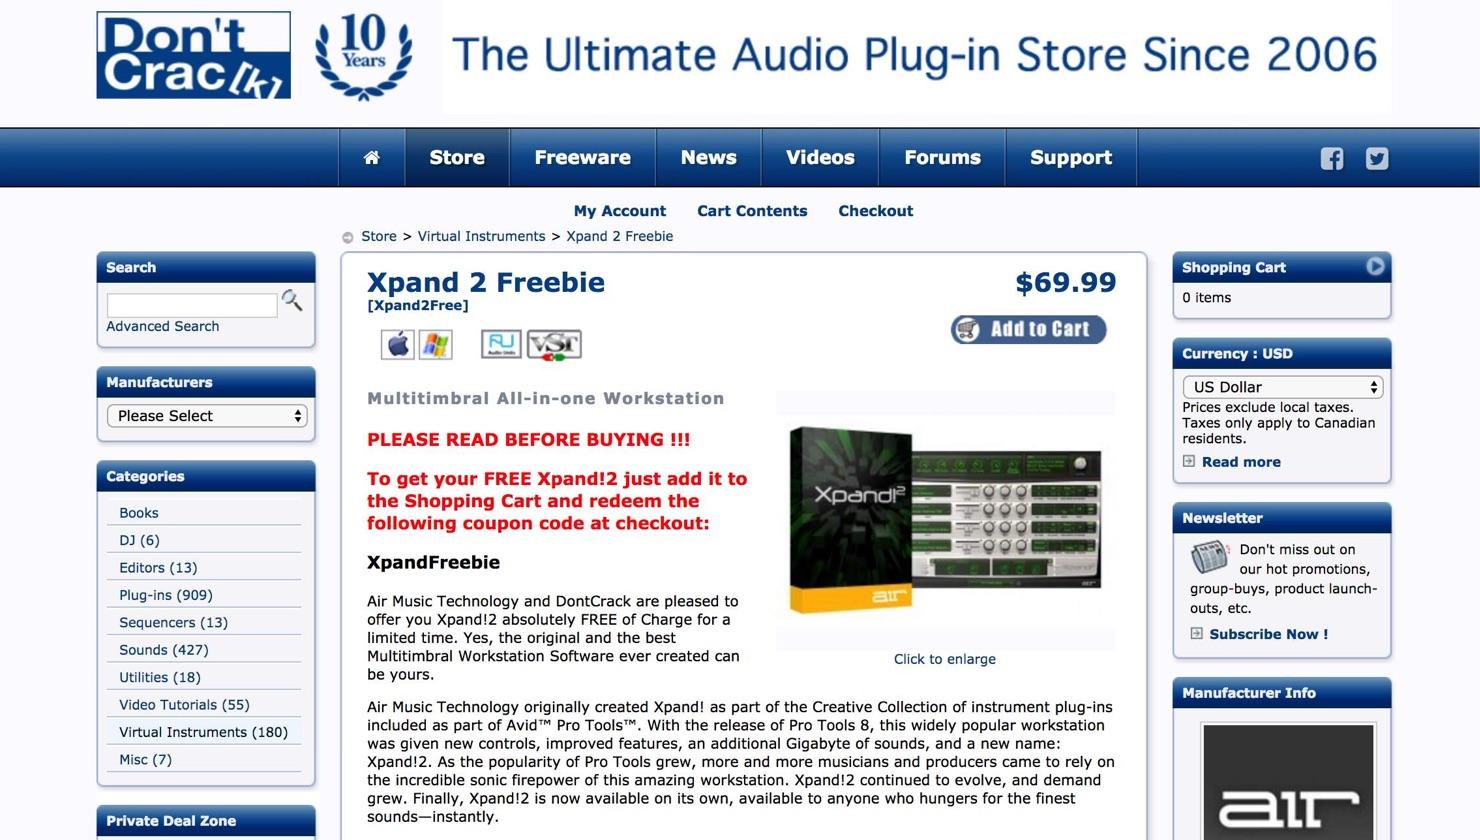 Xpand2-free-1